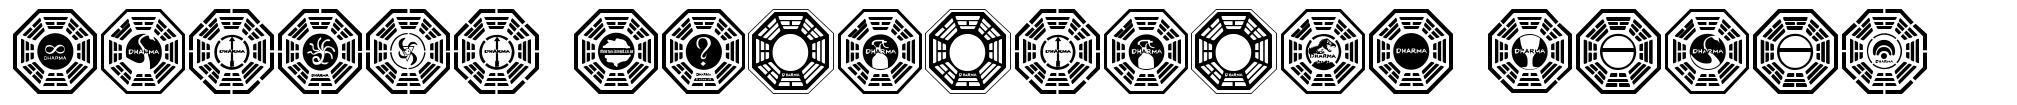 Dharma Initiative Logos police